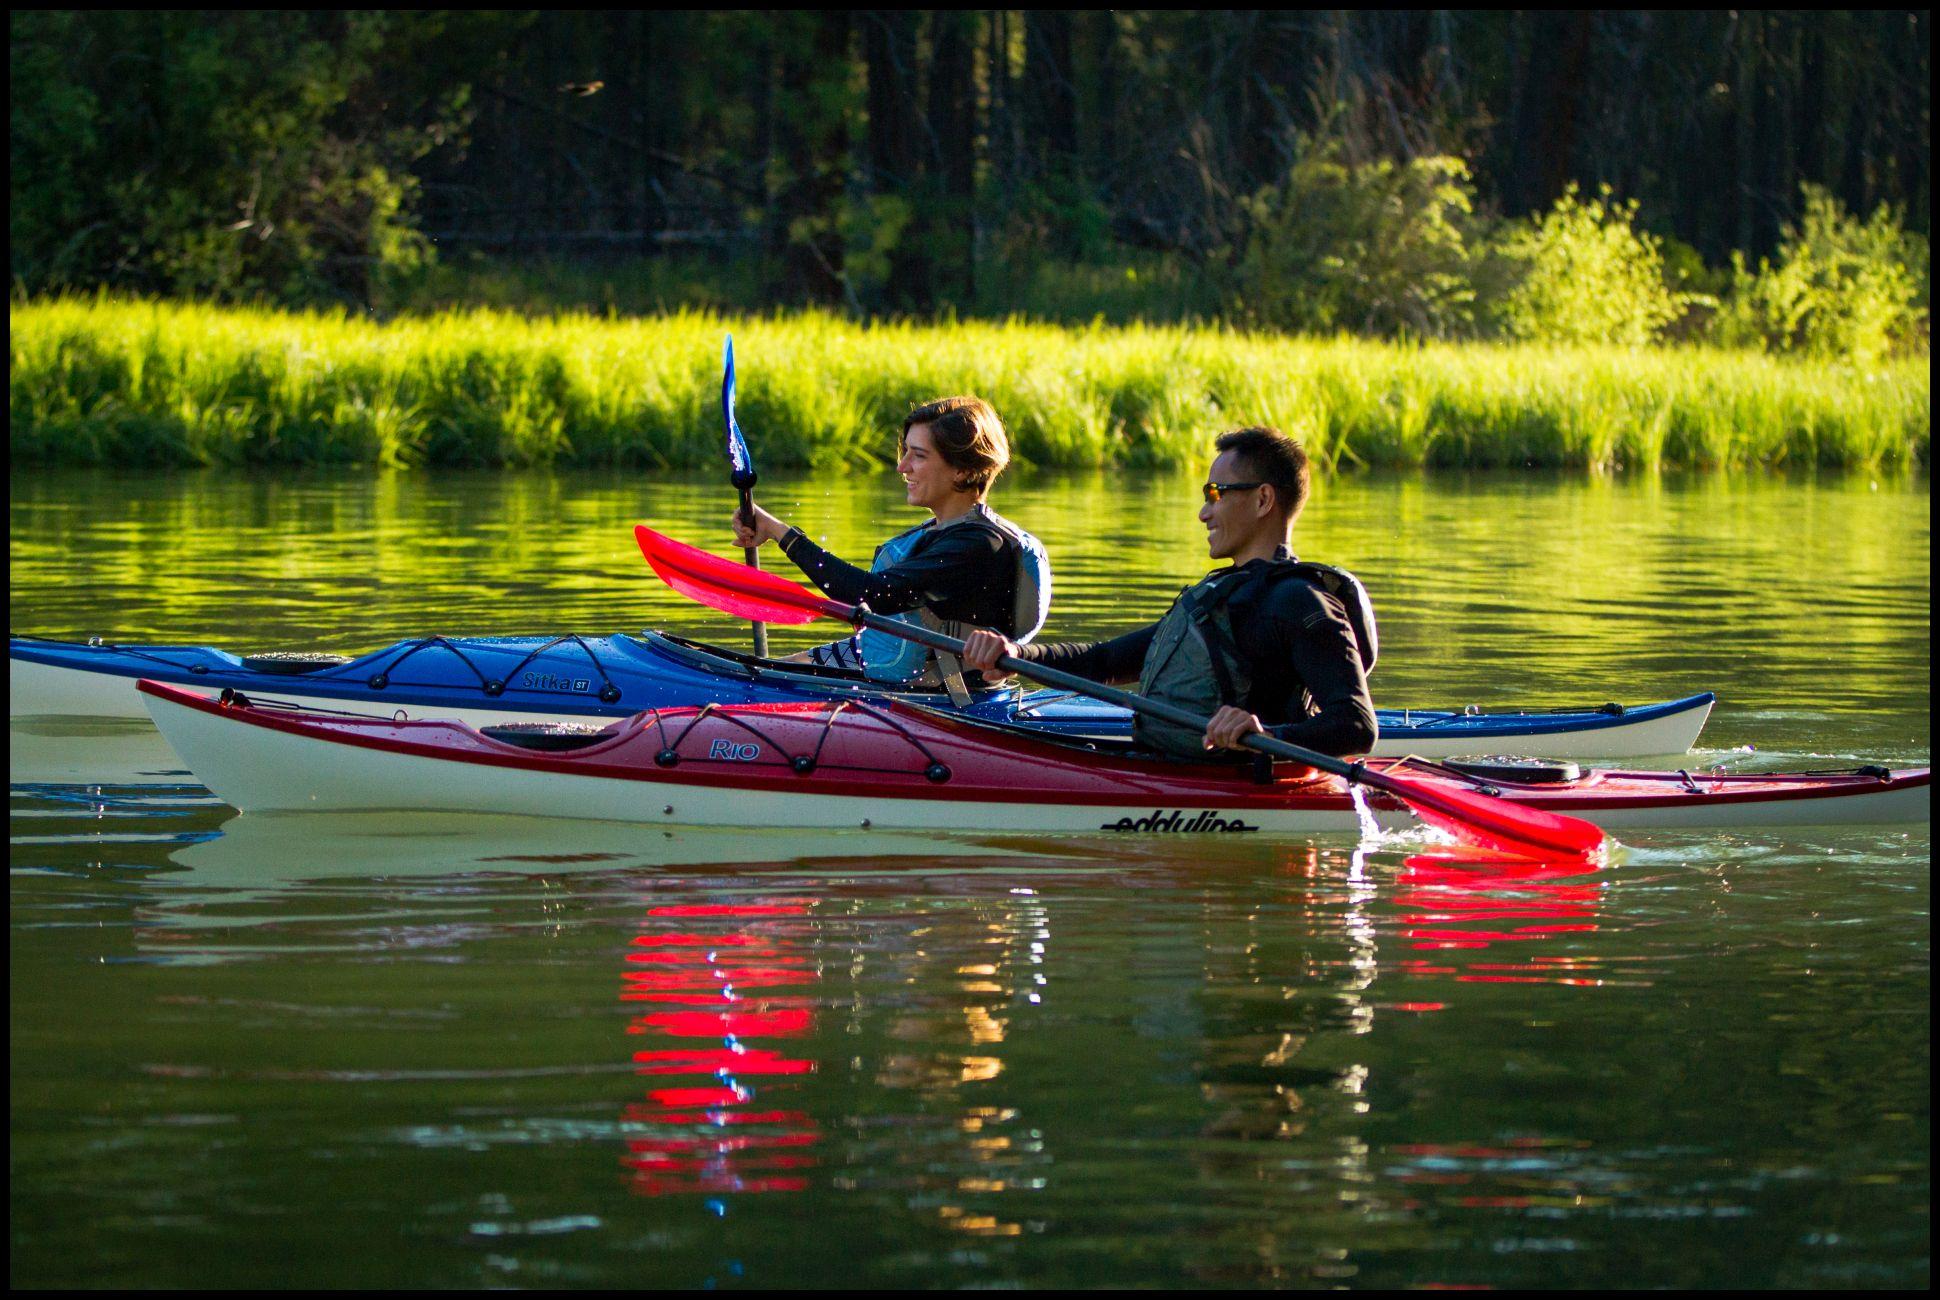 Kayaks: Rio by Eddyline Kayaks - Image 3385